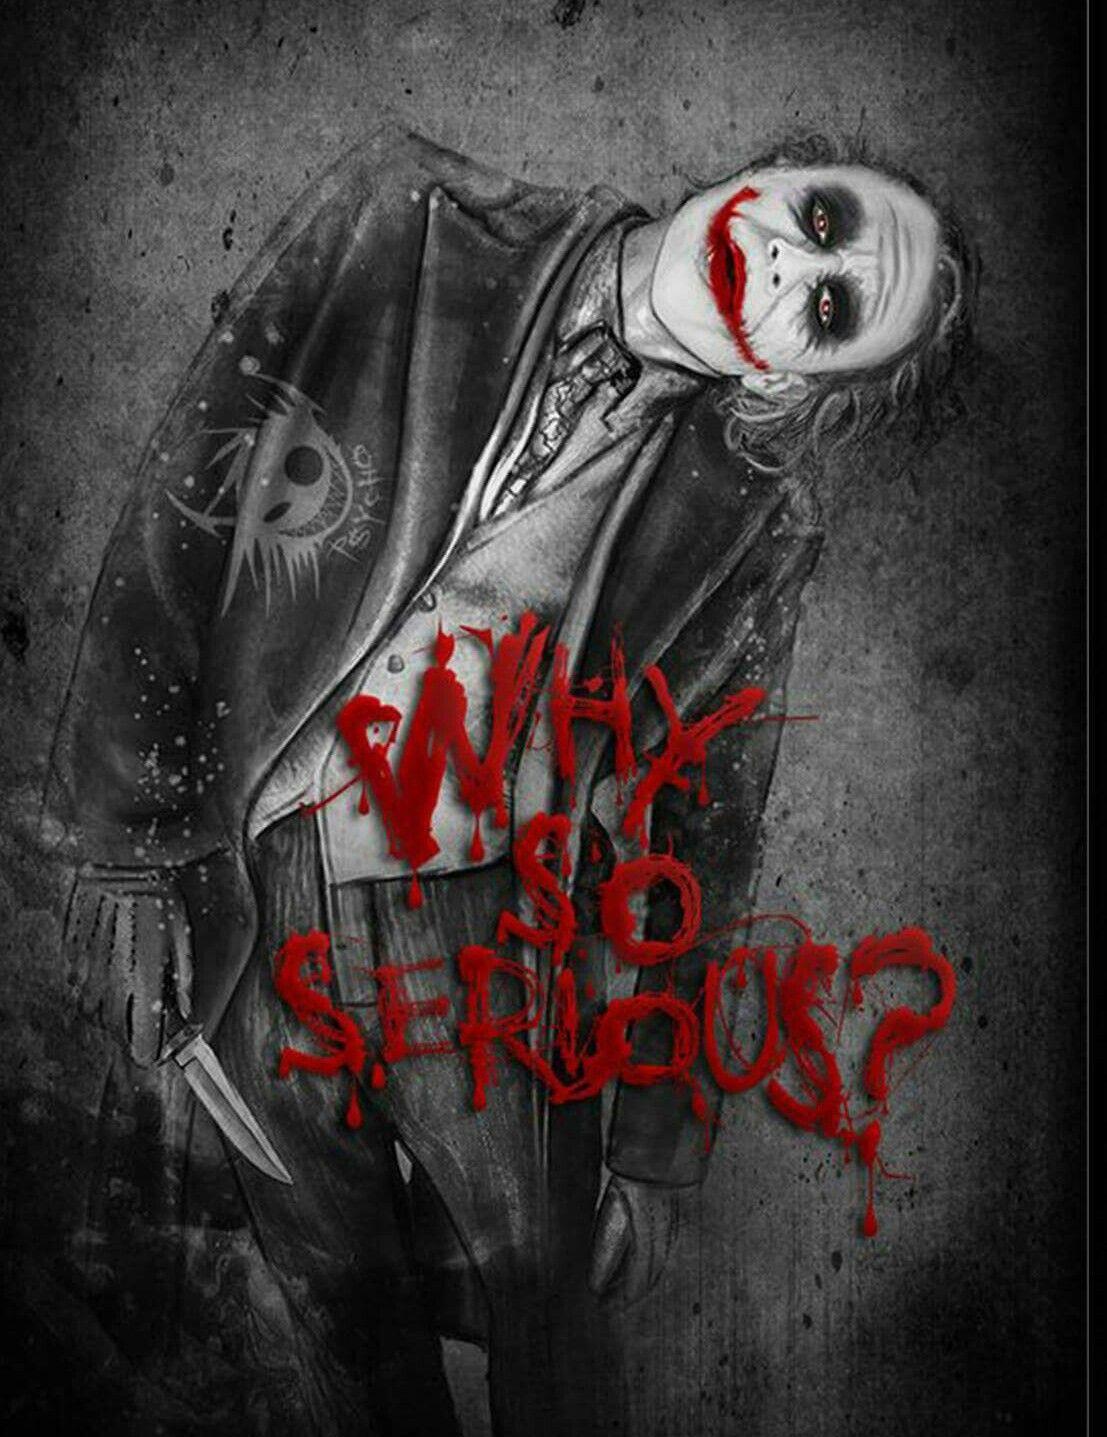 Joker Why So Serious Blood - 1107x1437 ...